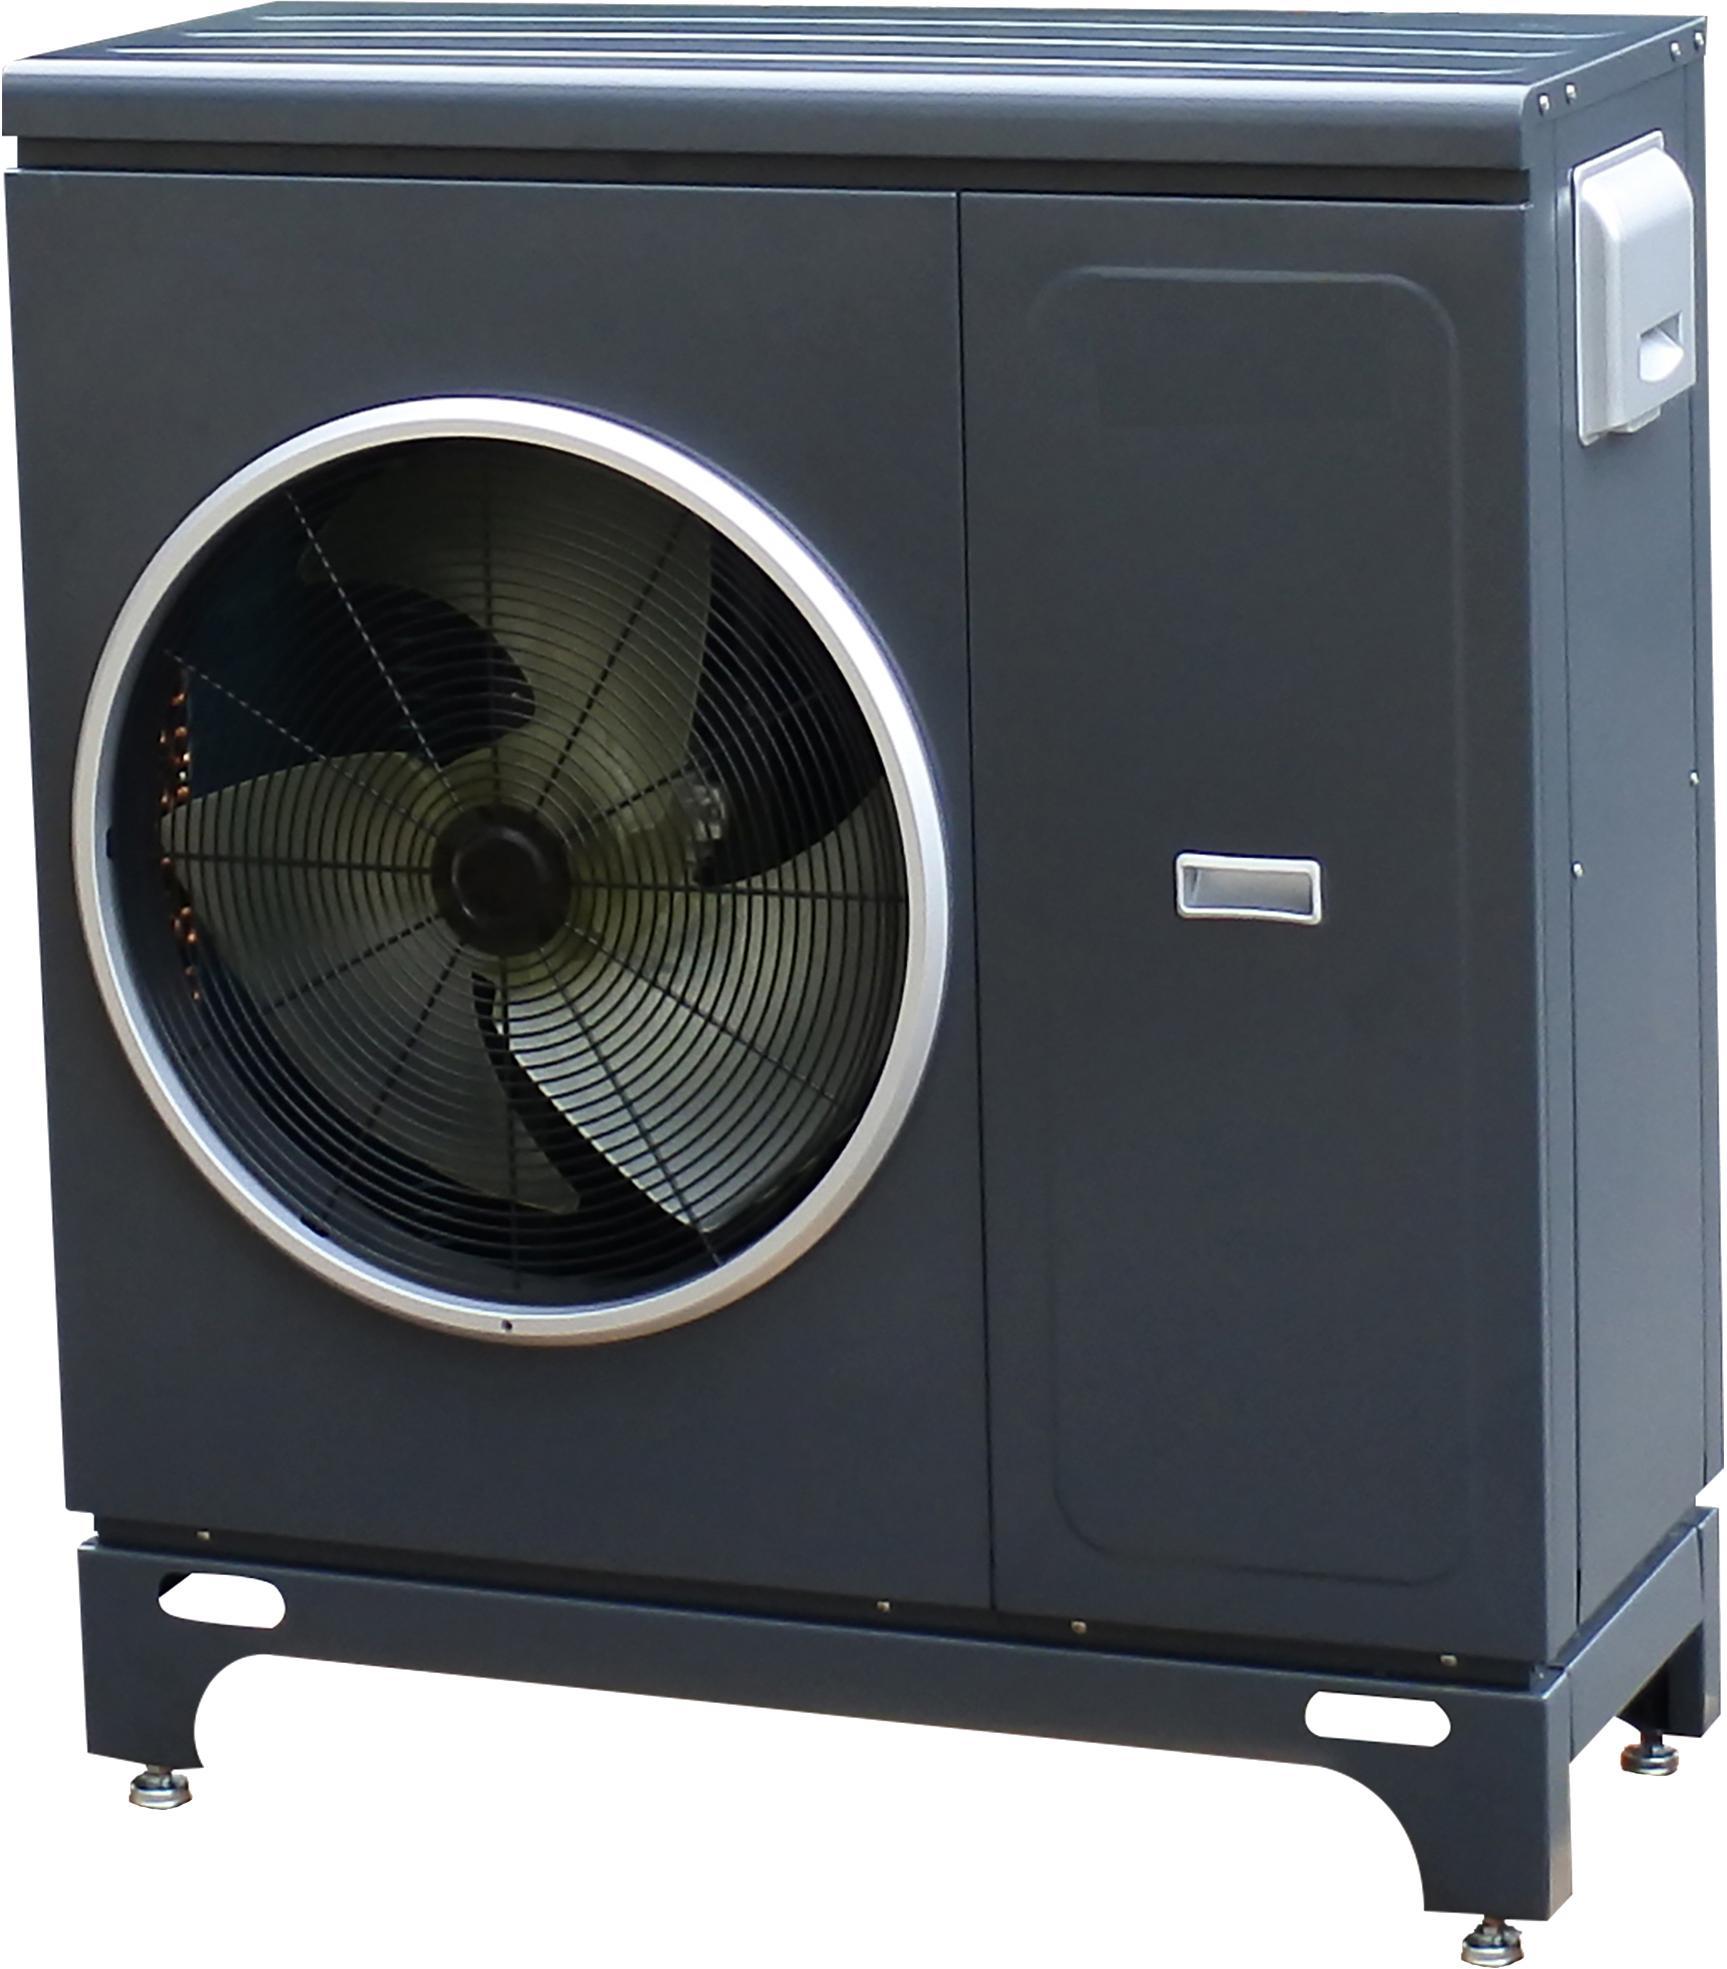 RS15V/L R32 EVI inverter heat pump